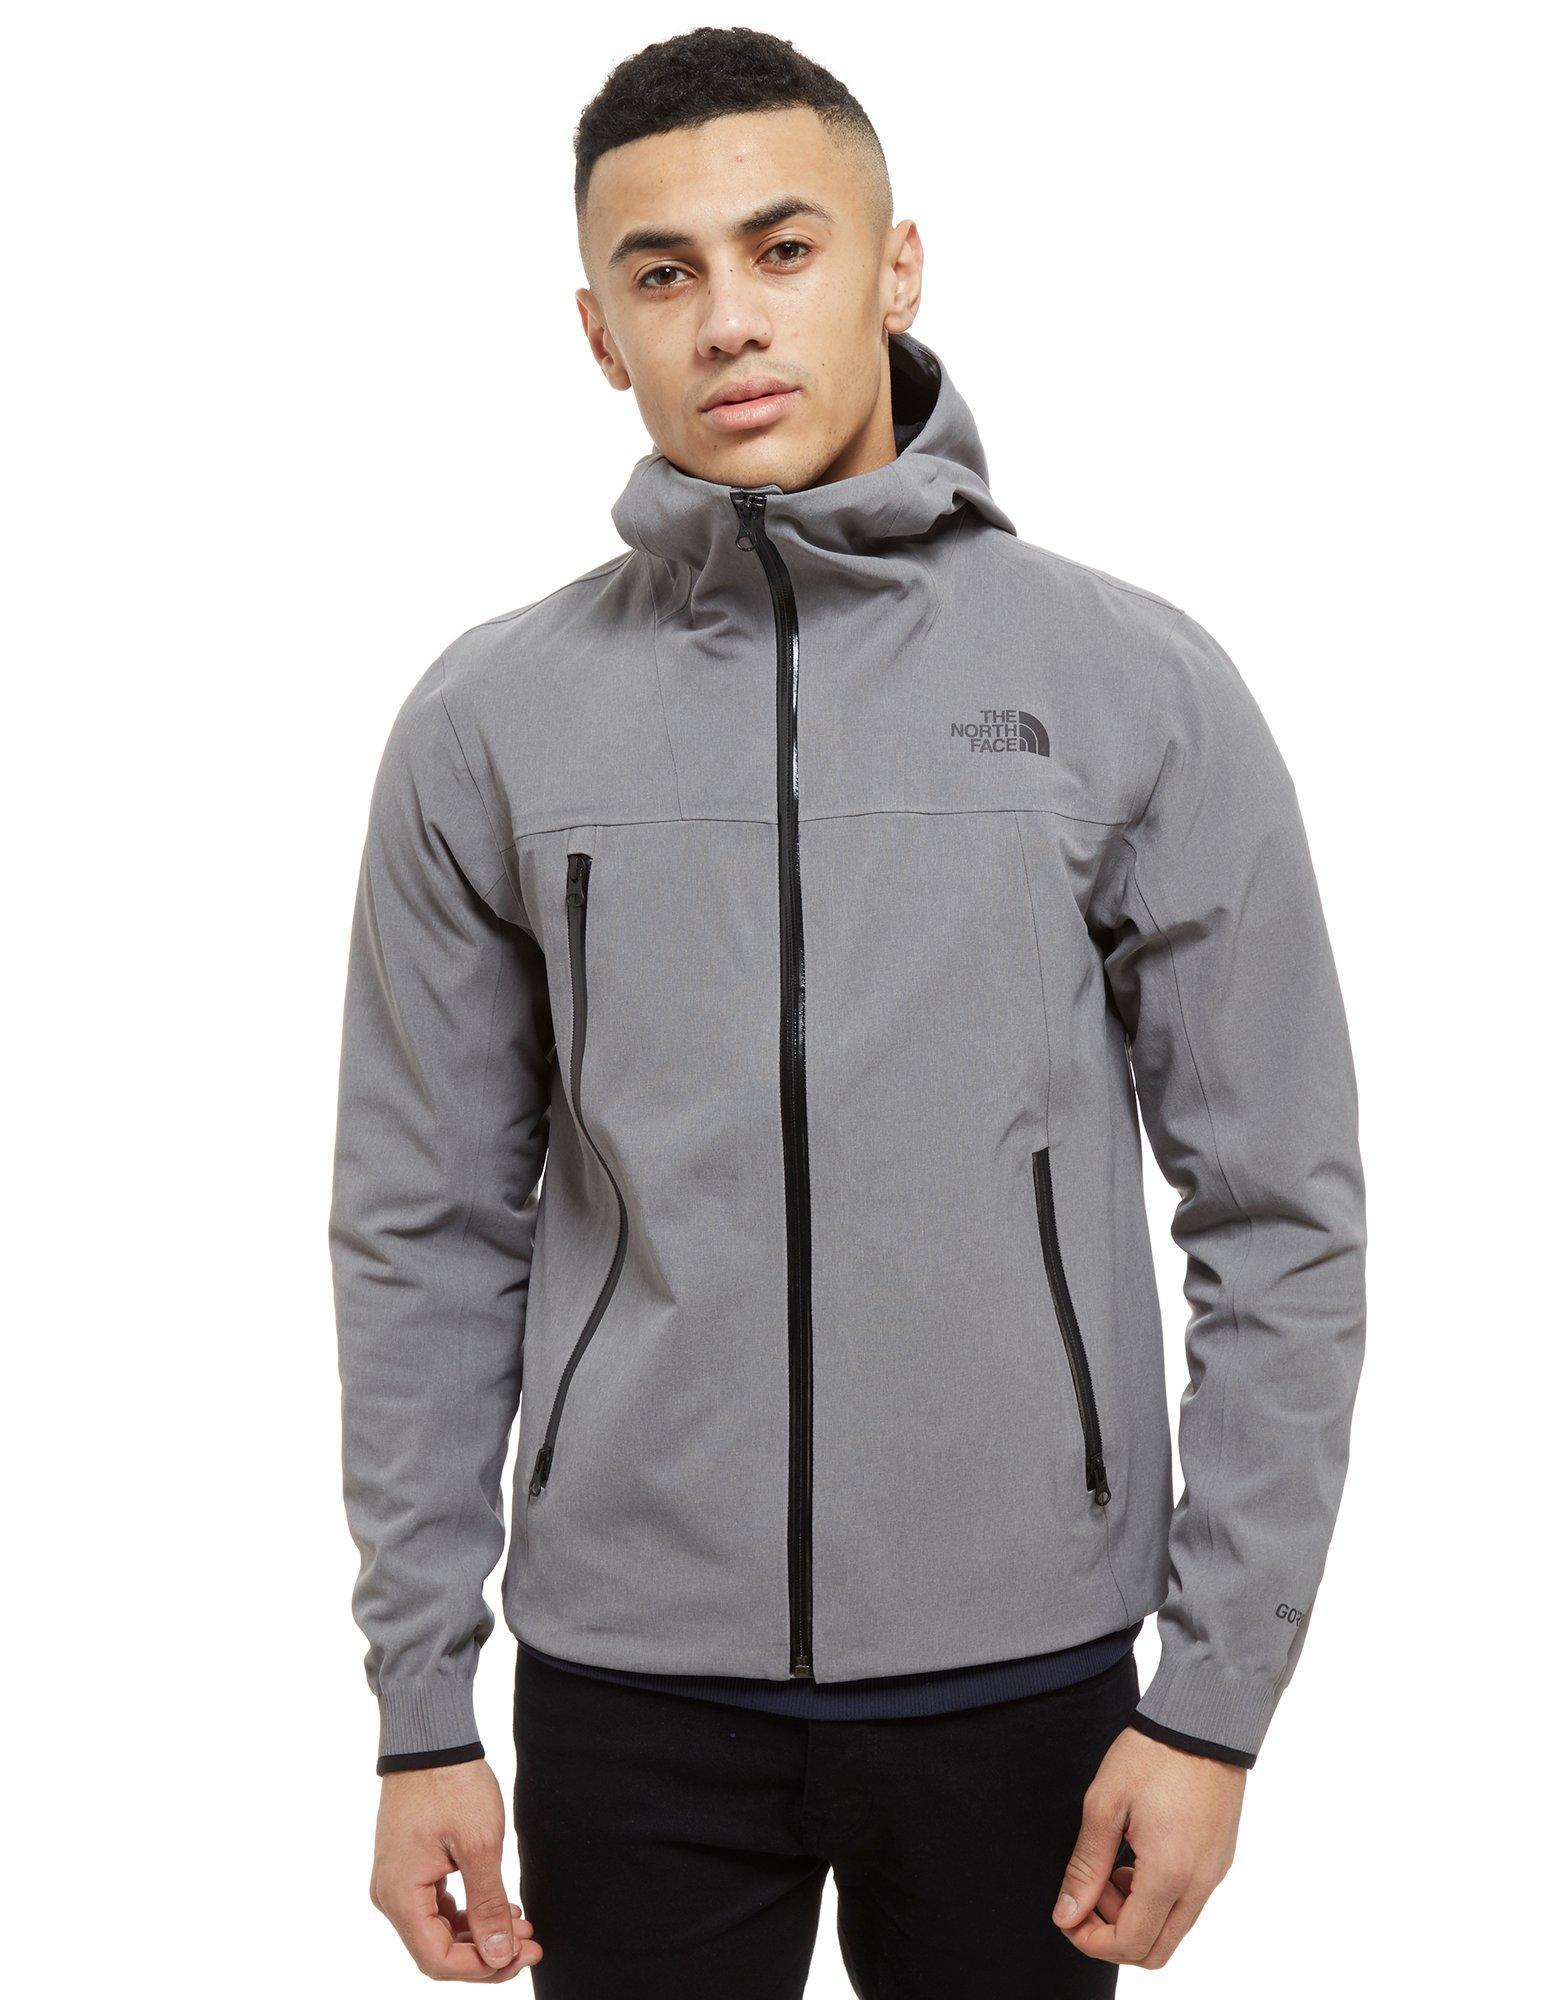 dedcdc448 The North Face Gray Apex Flex Gtx City Jacket for men